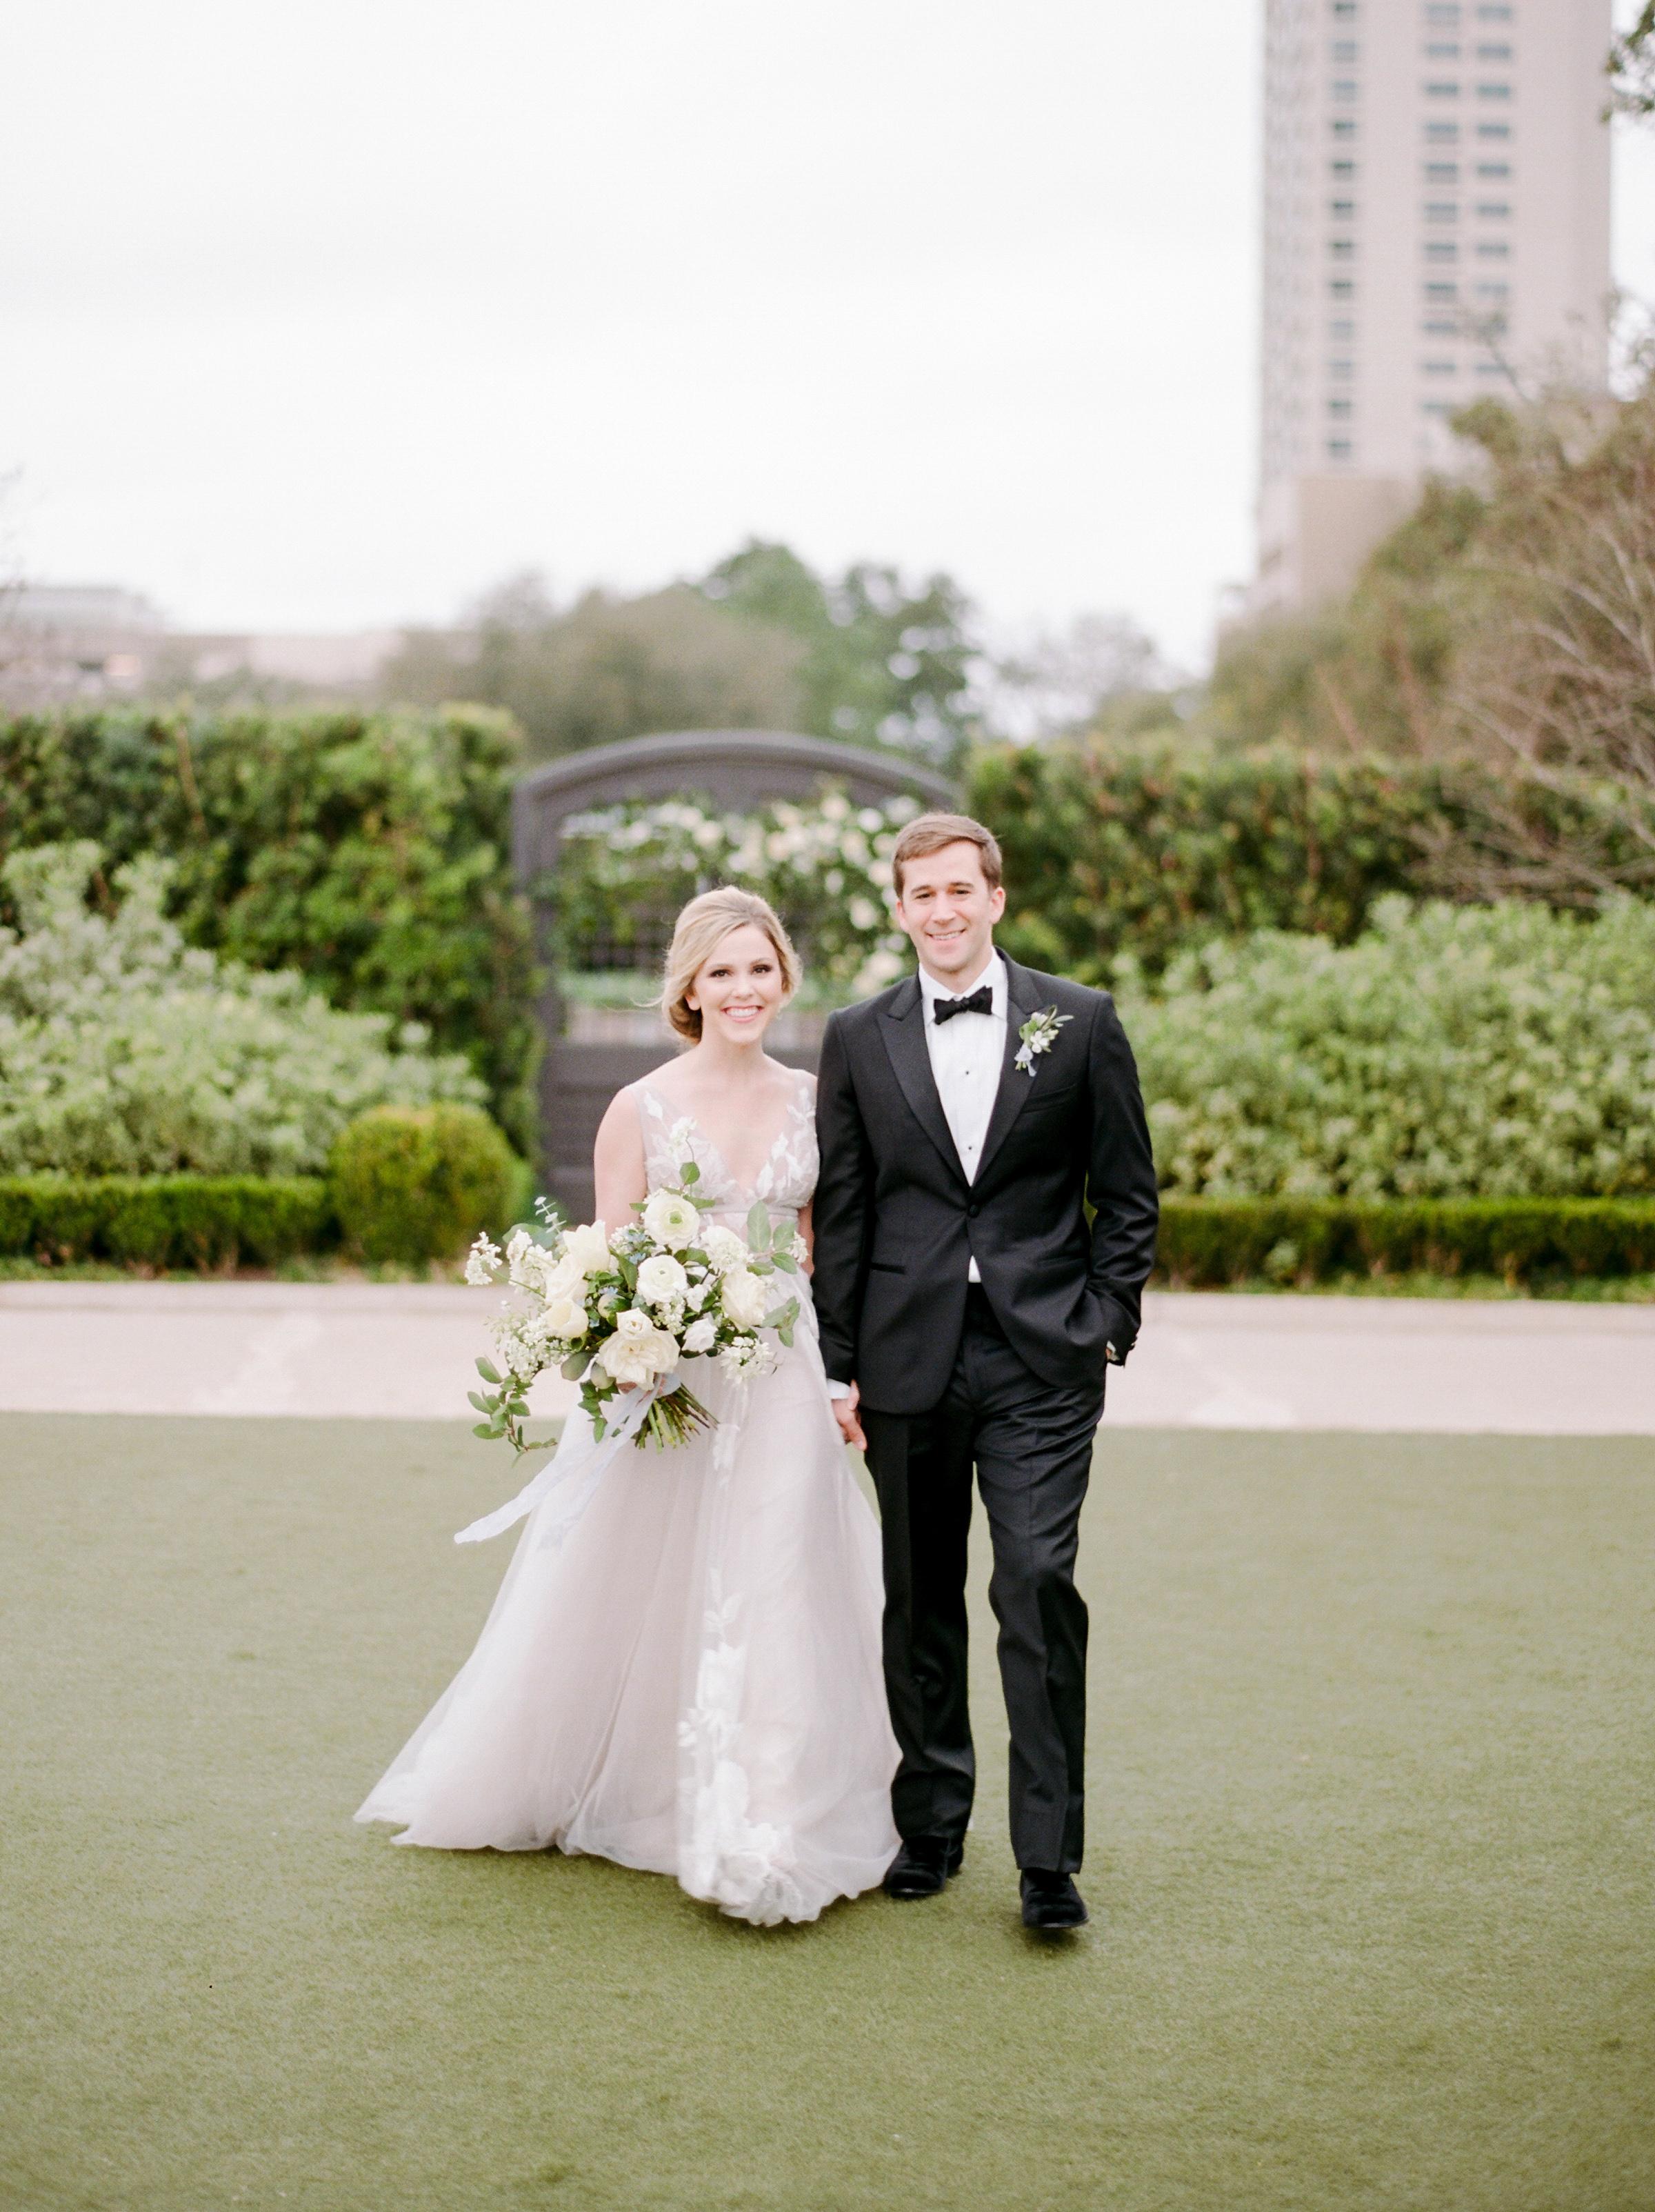 McGovern-Centennial-Gardens-Houston-Texas-Wedding-Venue-Josh-Dana-Fernandez-Photography-Film-Destination-Fine-Art-Luxury-Top-Best-Austin-Dallas-Magnolia-Rouge-Jennifer-Laura-Design-16.jpg